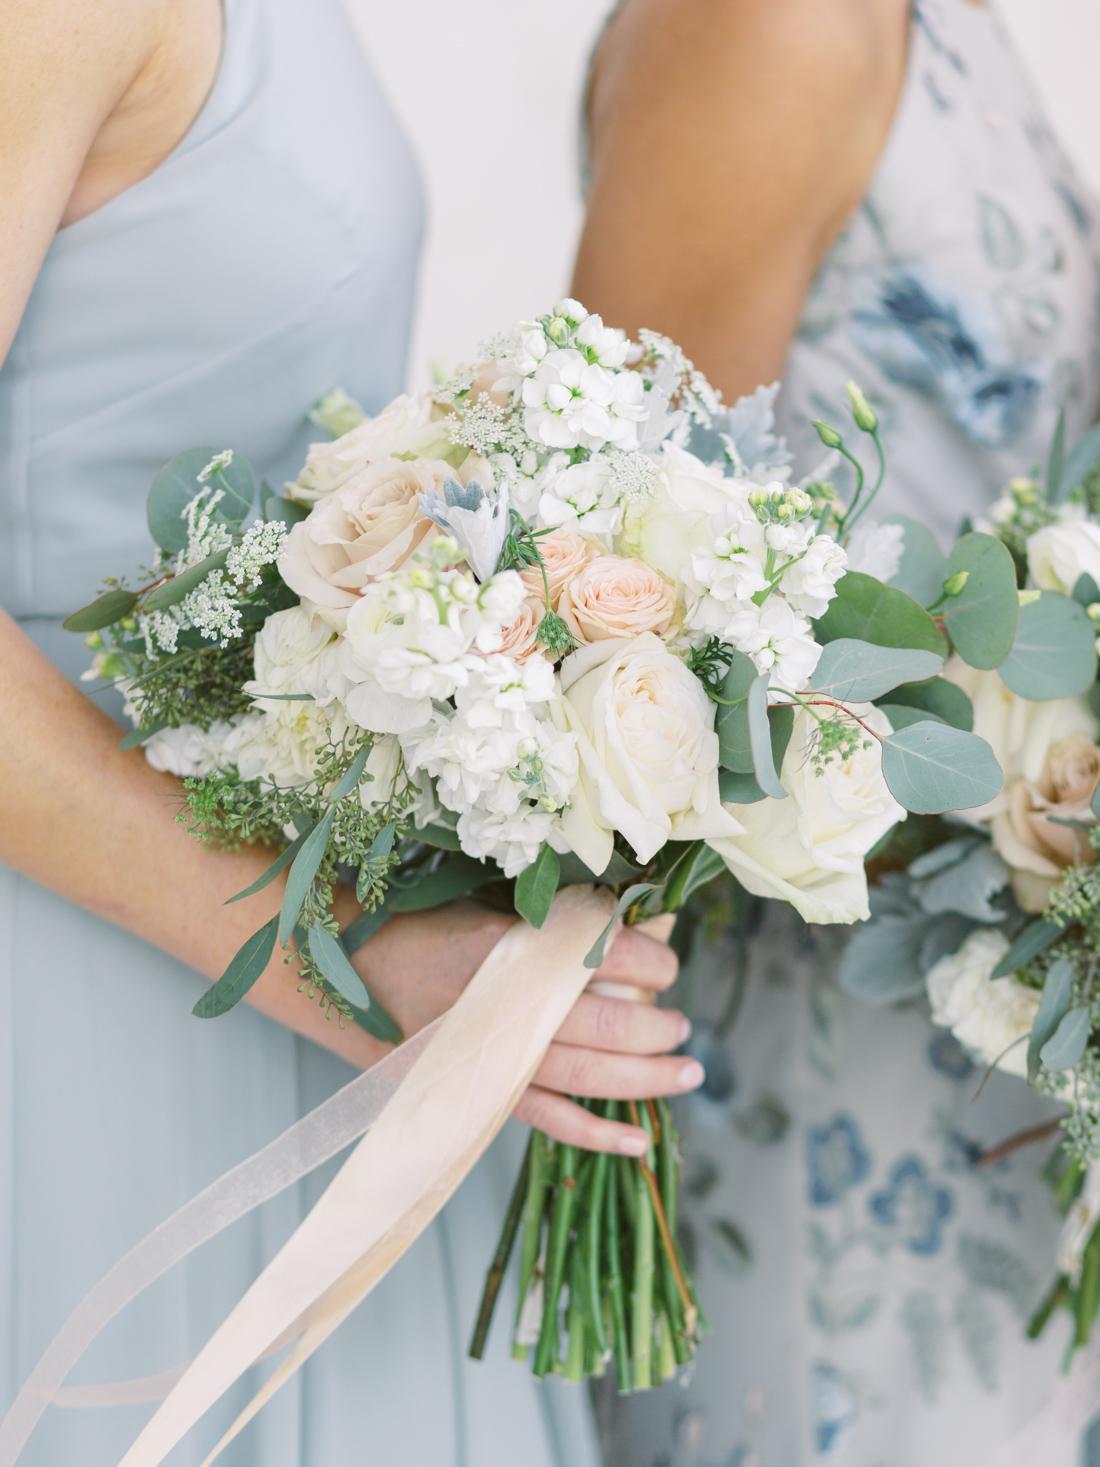 Washington-dc-wedding-floral-designer-holly-frisch